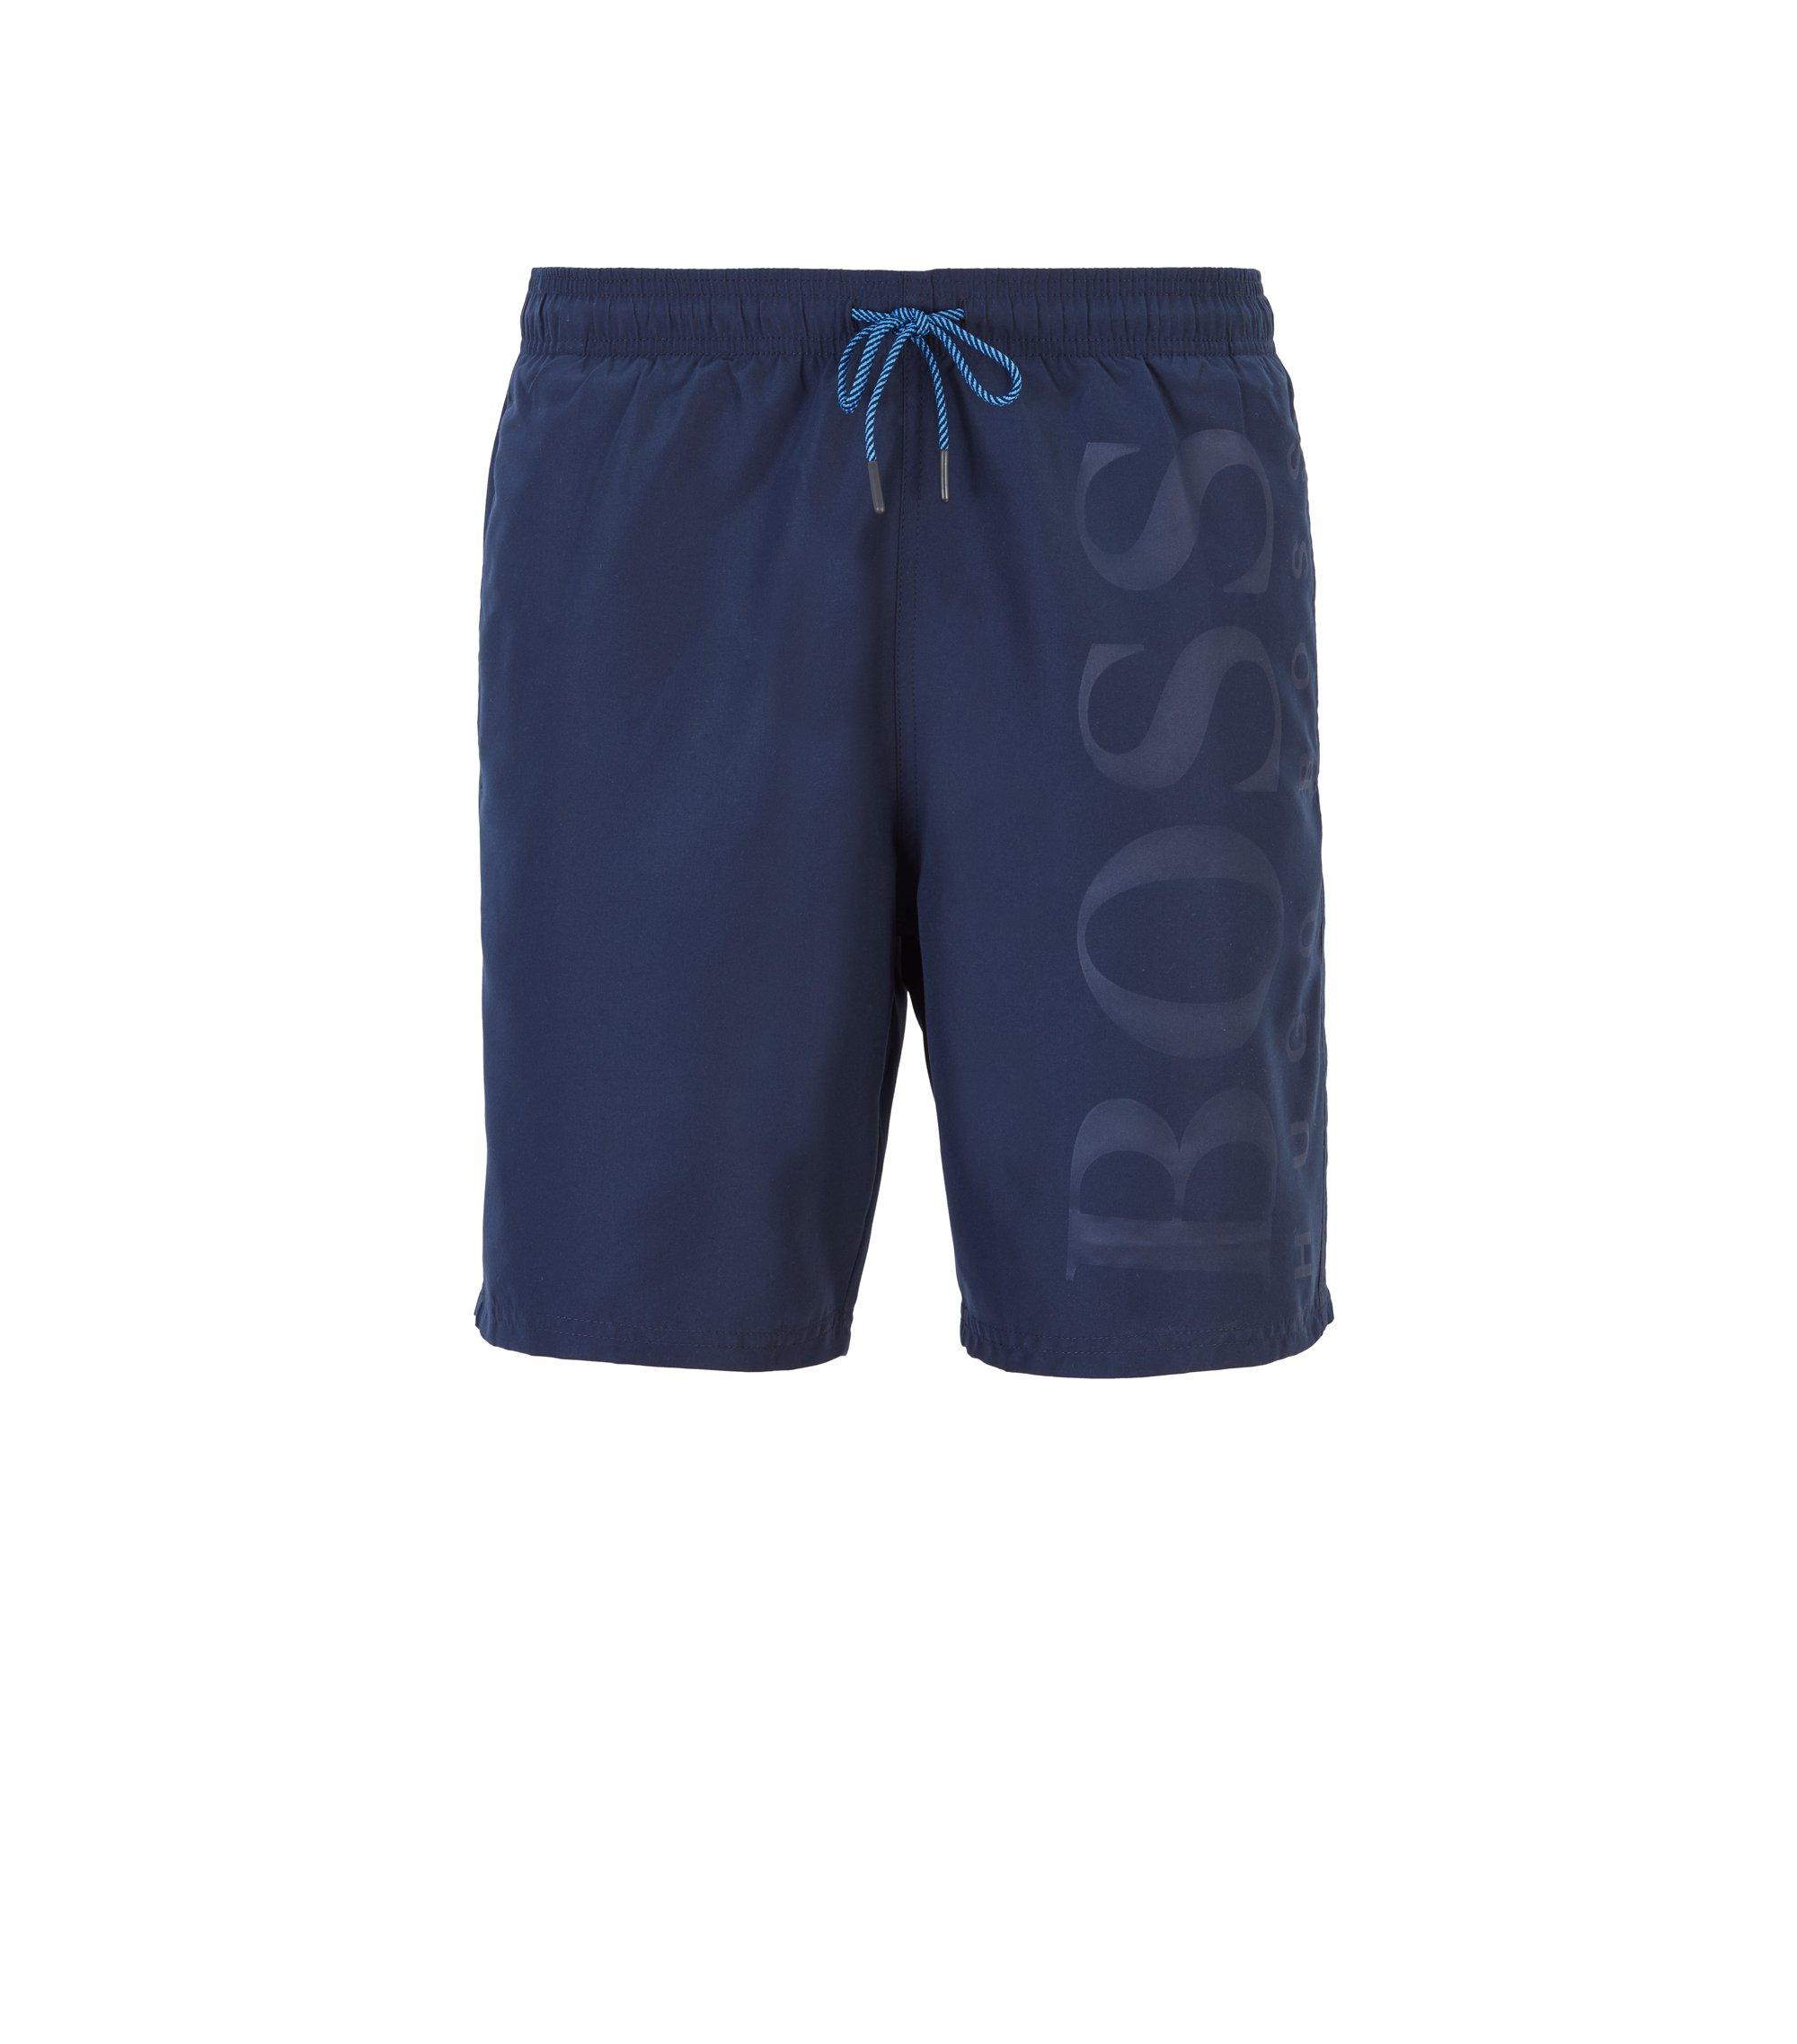 Maillot de bain en tissu technique avec cordon de serrage, Bleu foncé